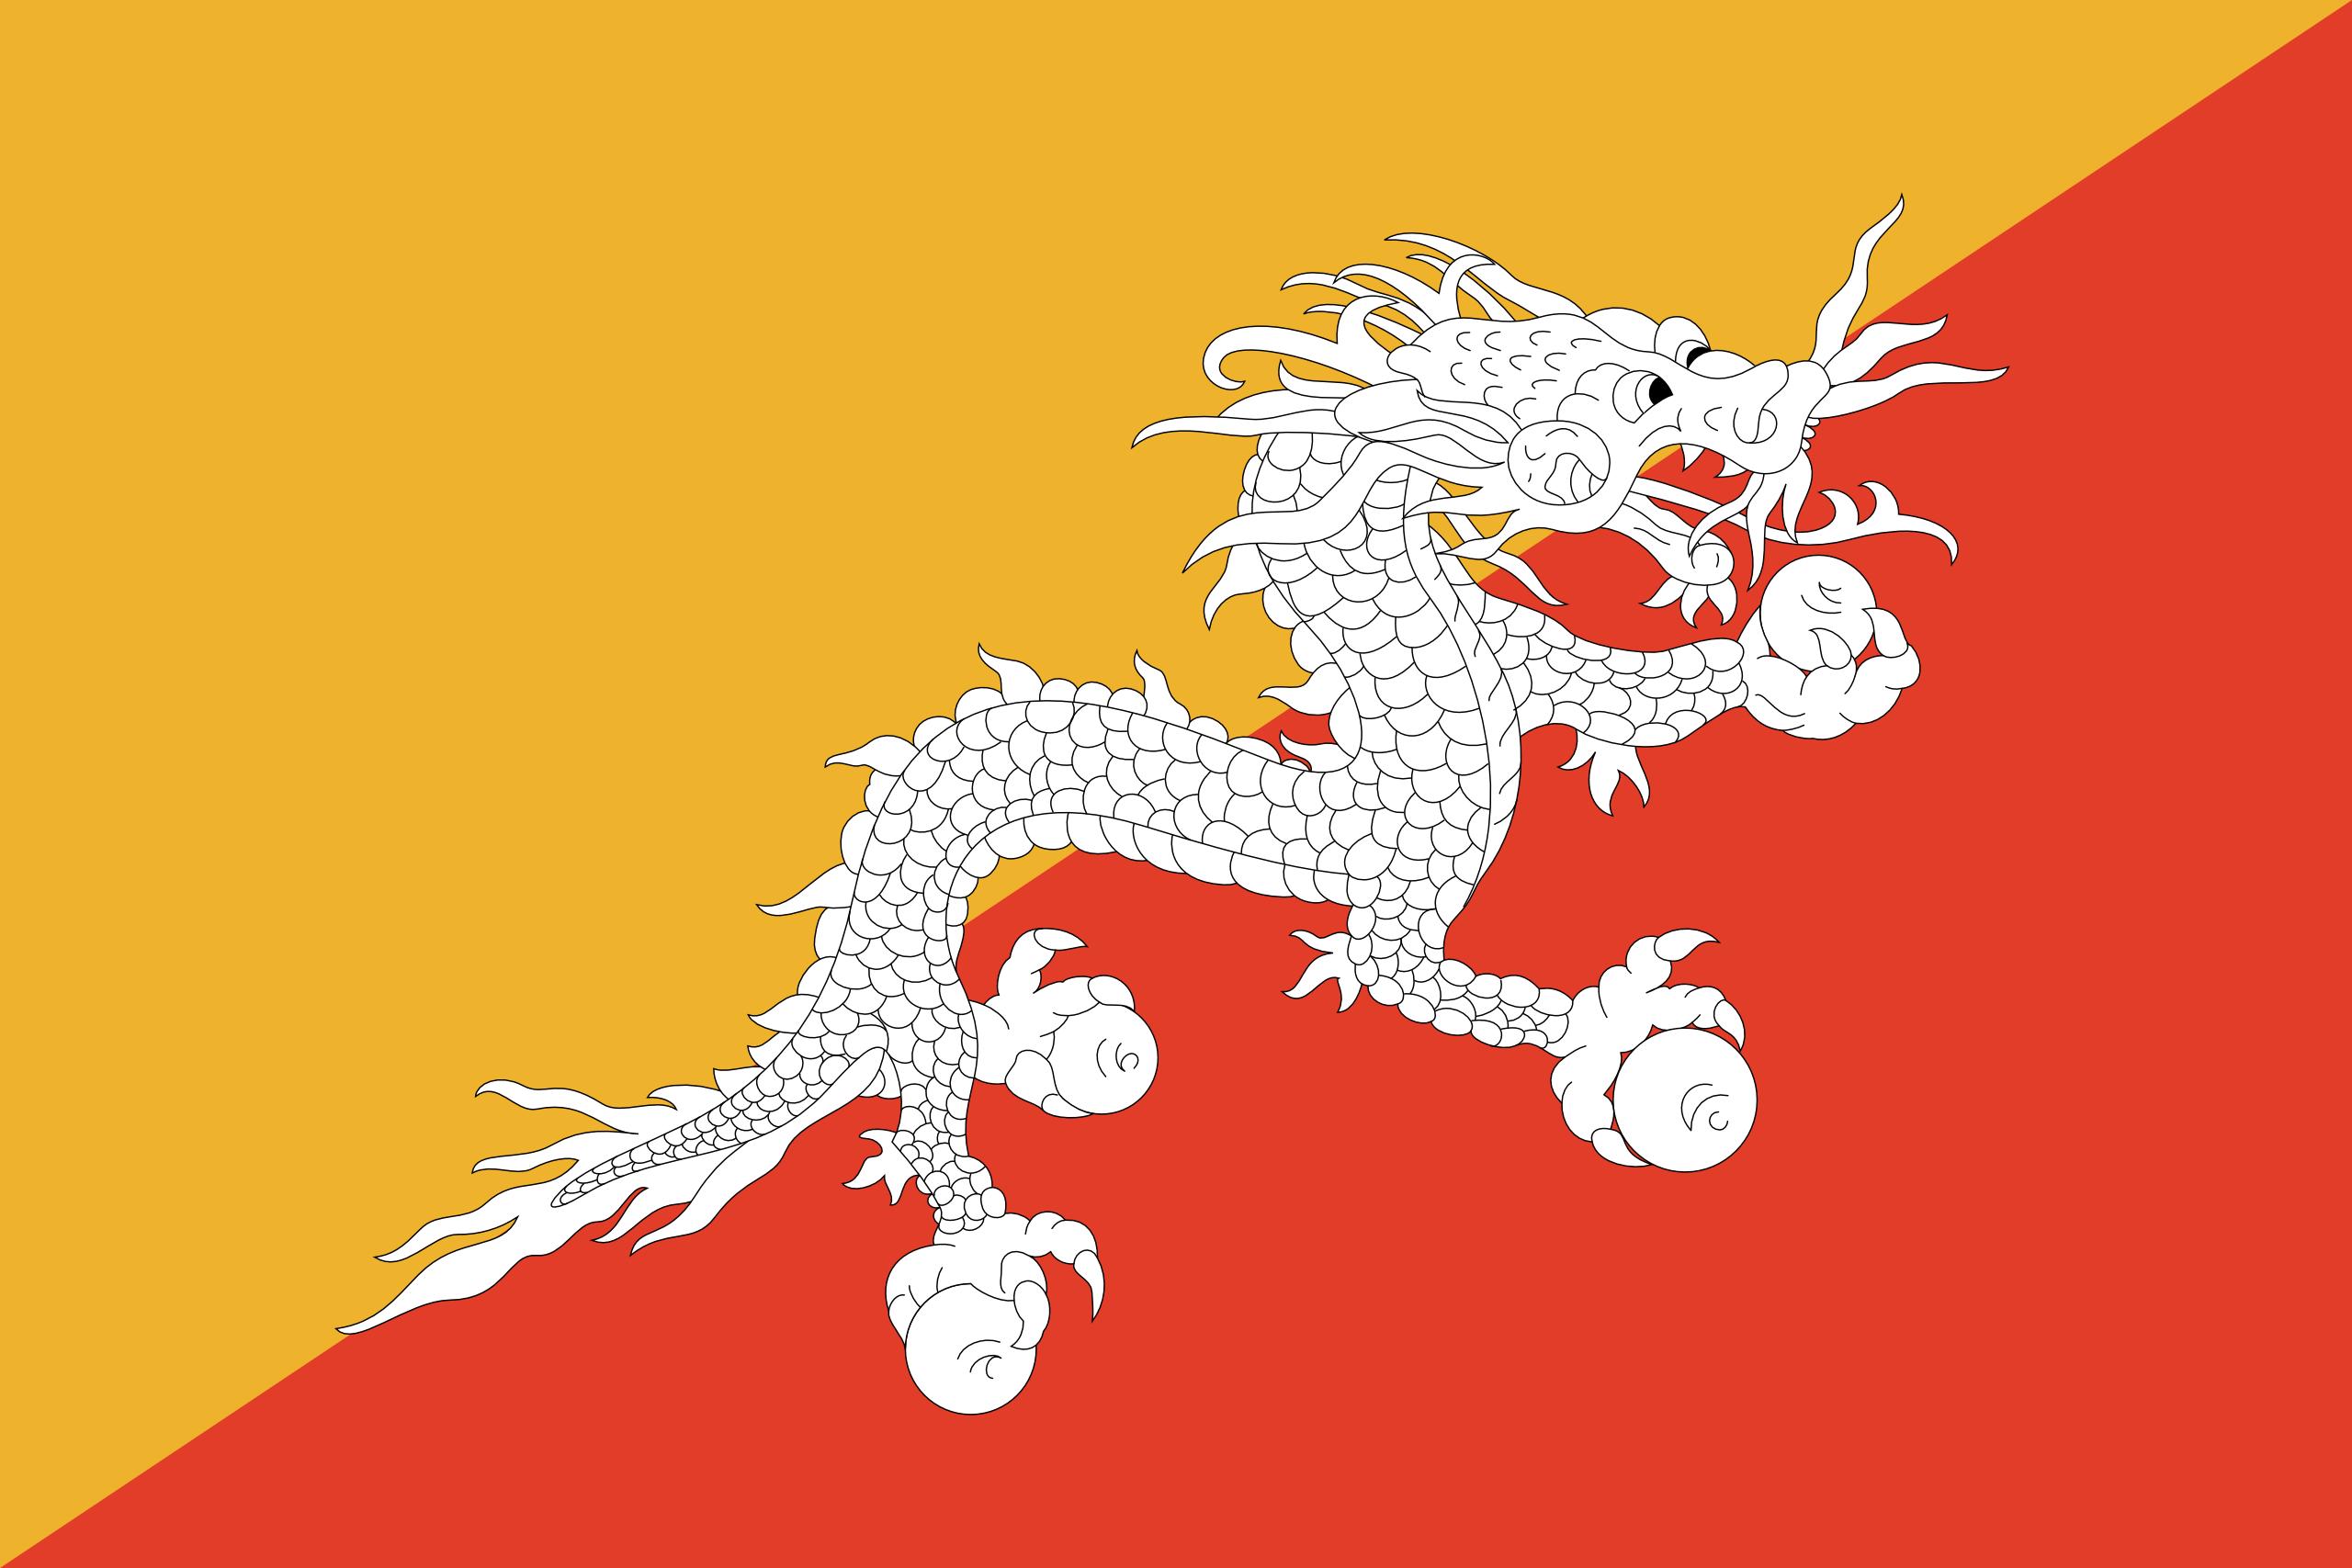 Бутан, страна, Эмблема, логотип, символ - Обои HD - Профессор falken.com